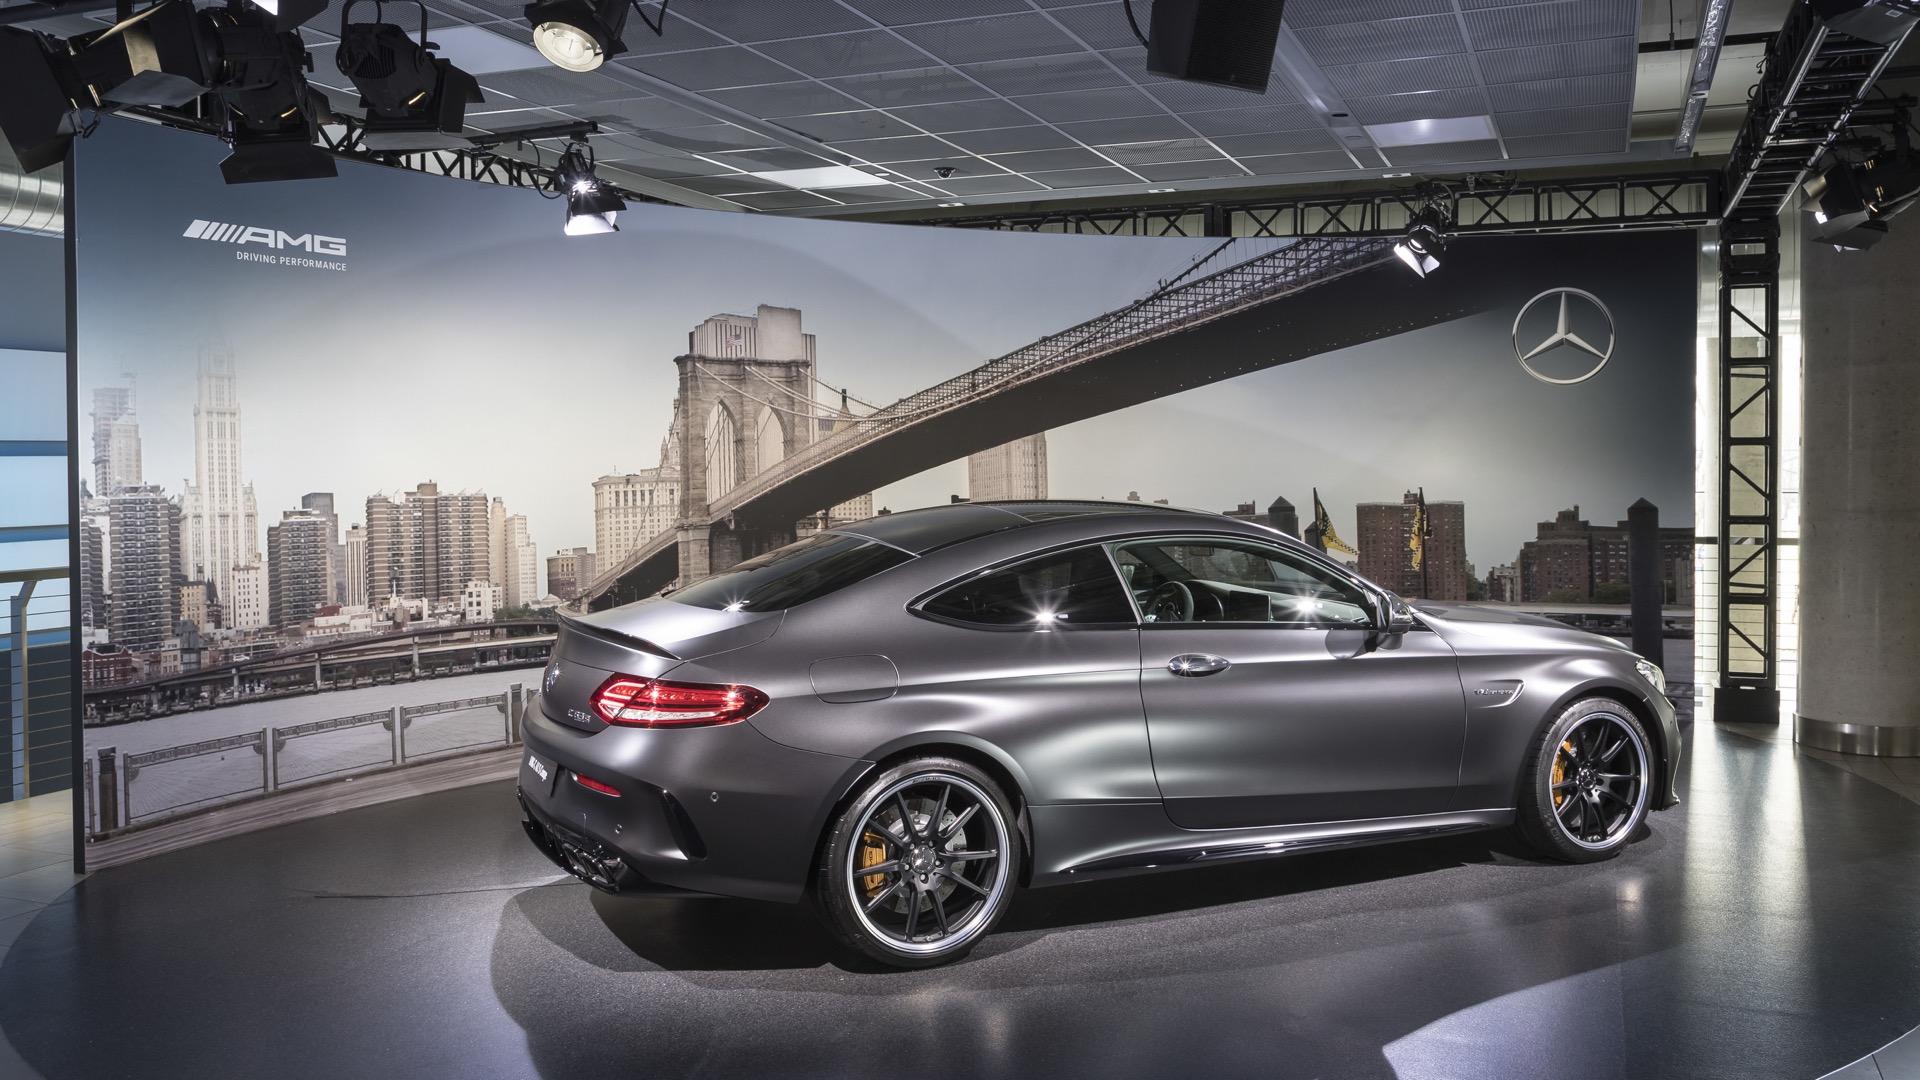 Meet Mercedes New York 2018 1 Of 24 The